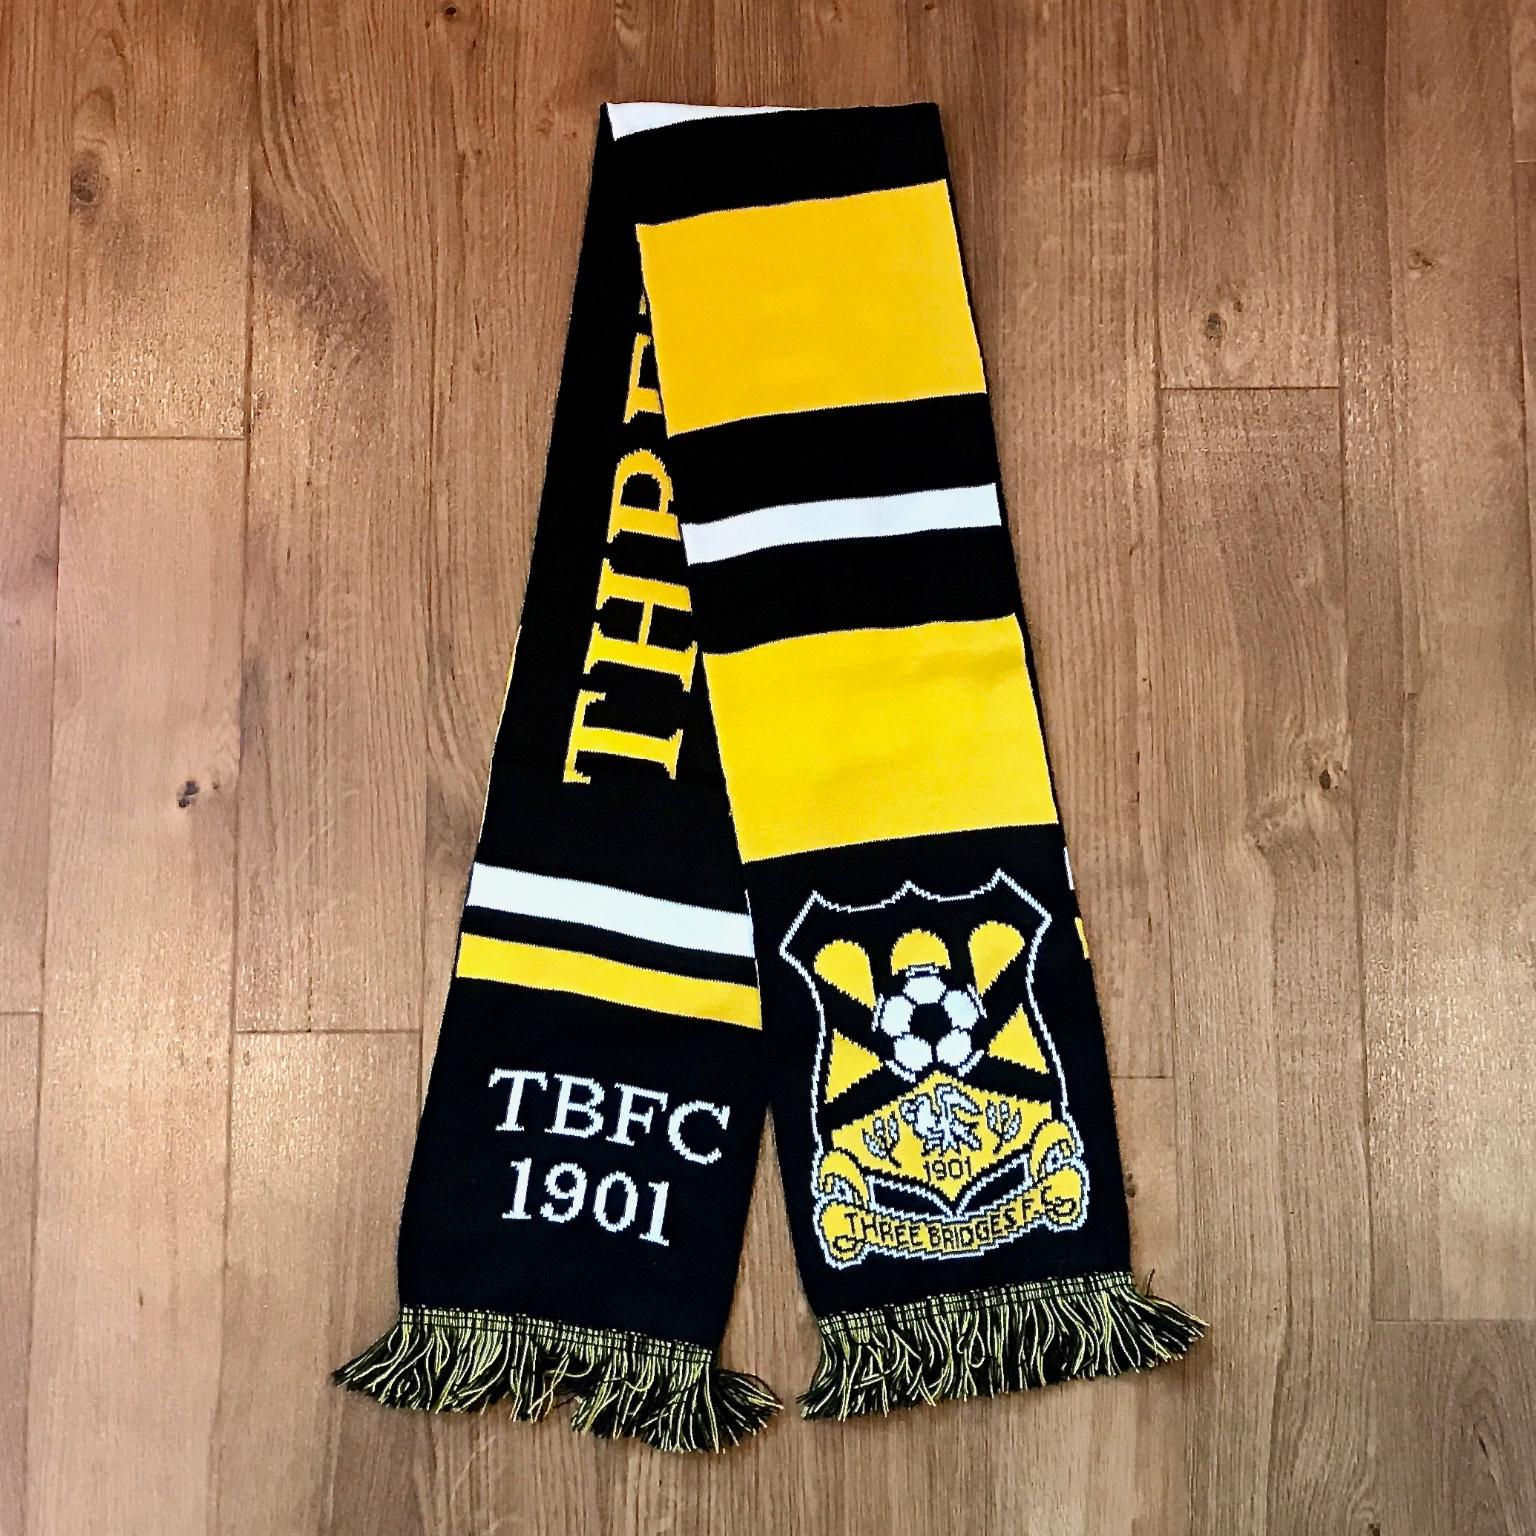 Image: TBFC scarf